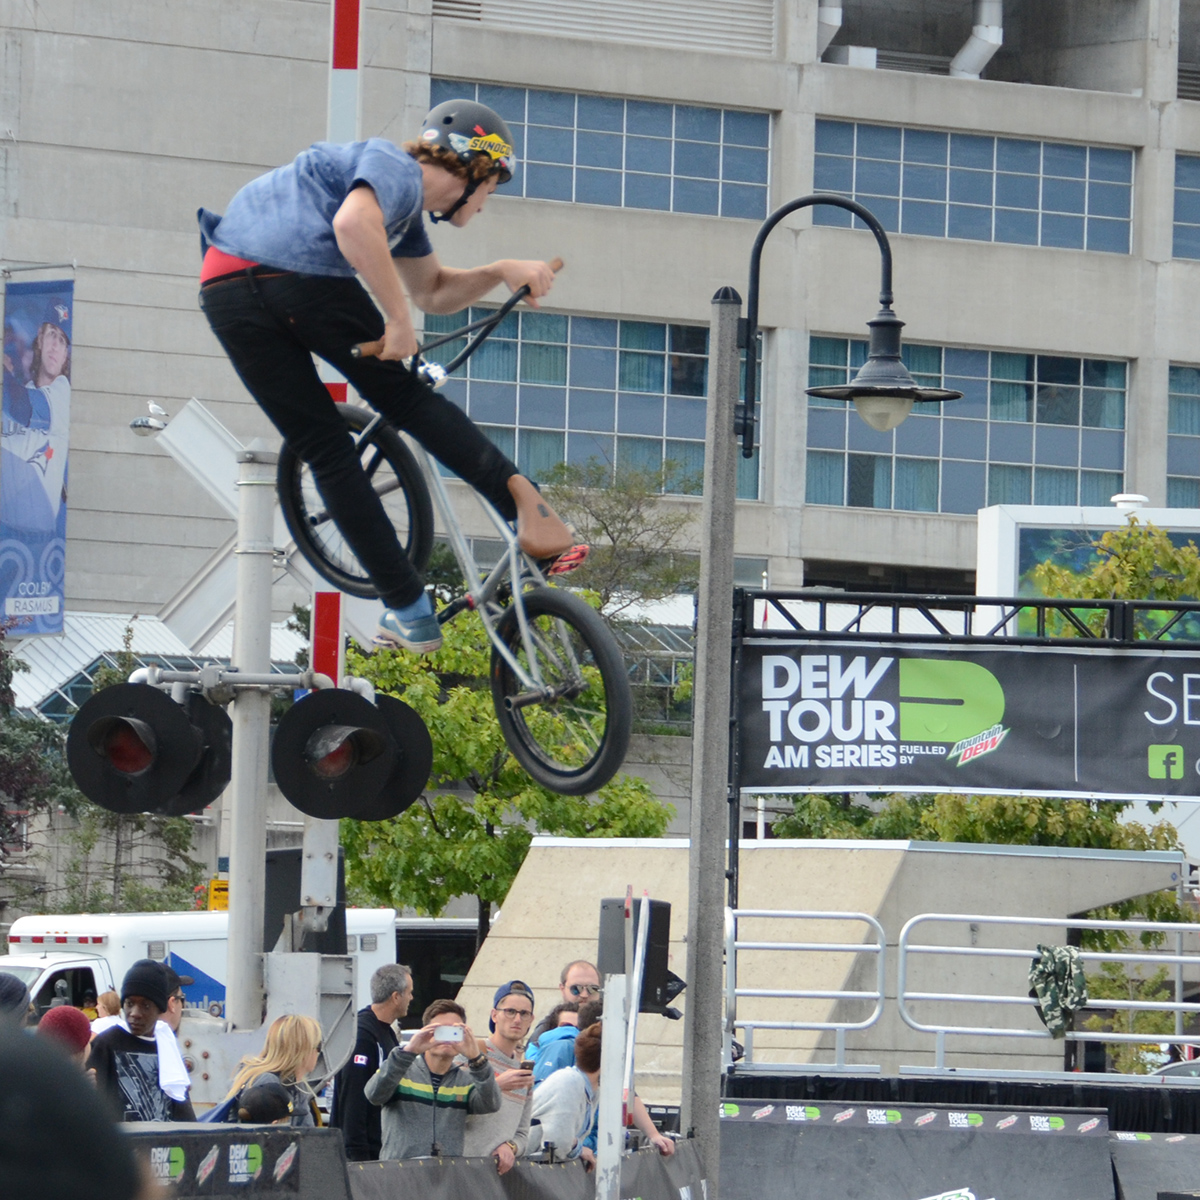 Jamie Cooper Elilis cranks a turndown at Dew Tour Am Series in Toronto